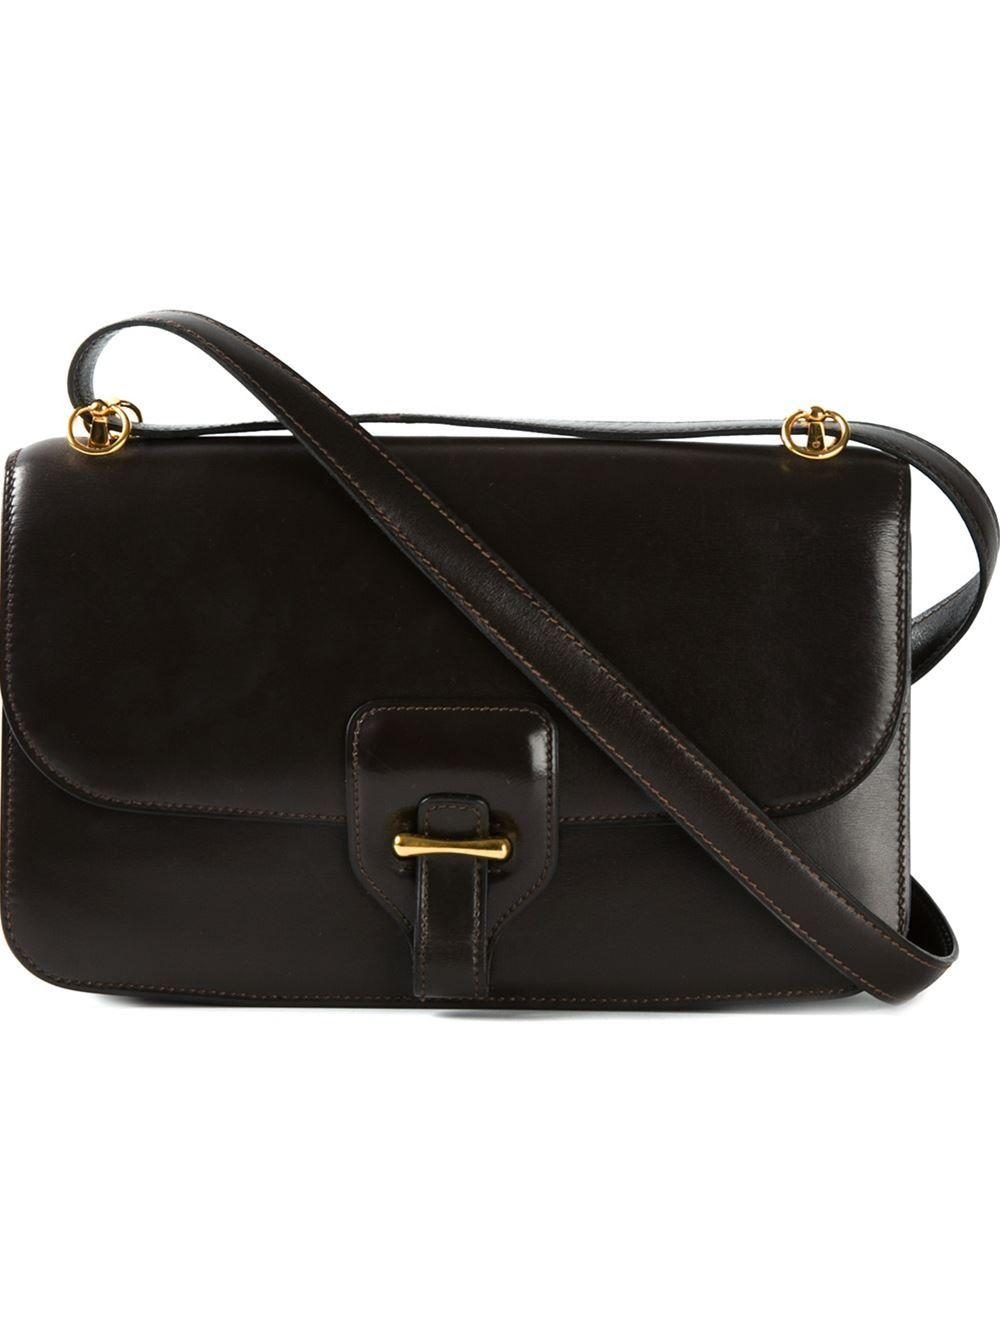 Hermès Vintage Classic Shoulder Bag - Dressing Factory - Farfetch.com